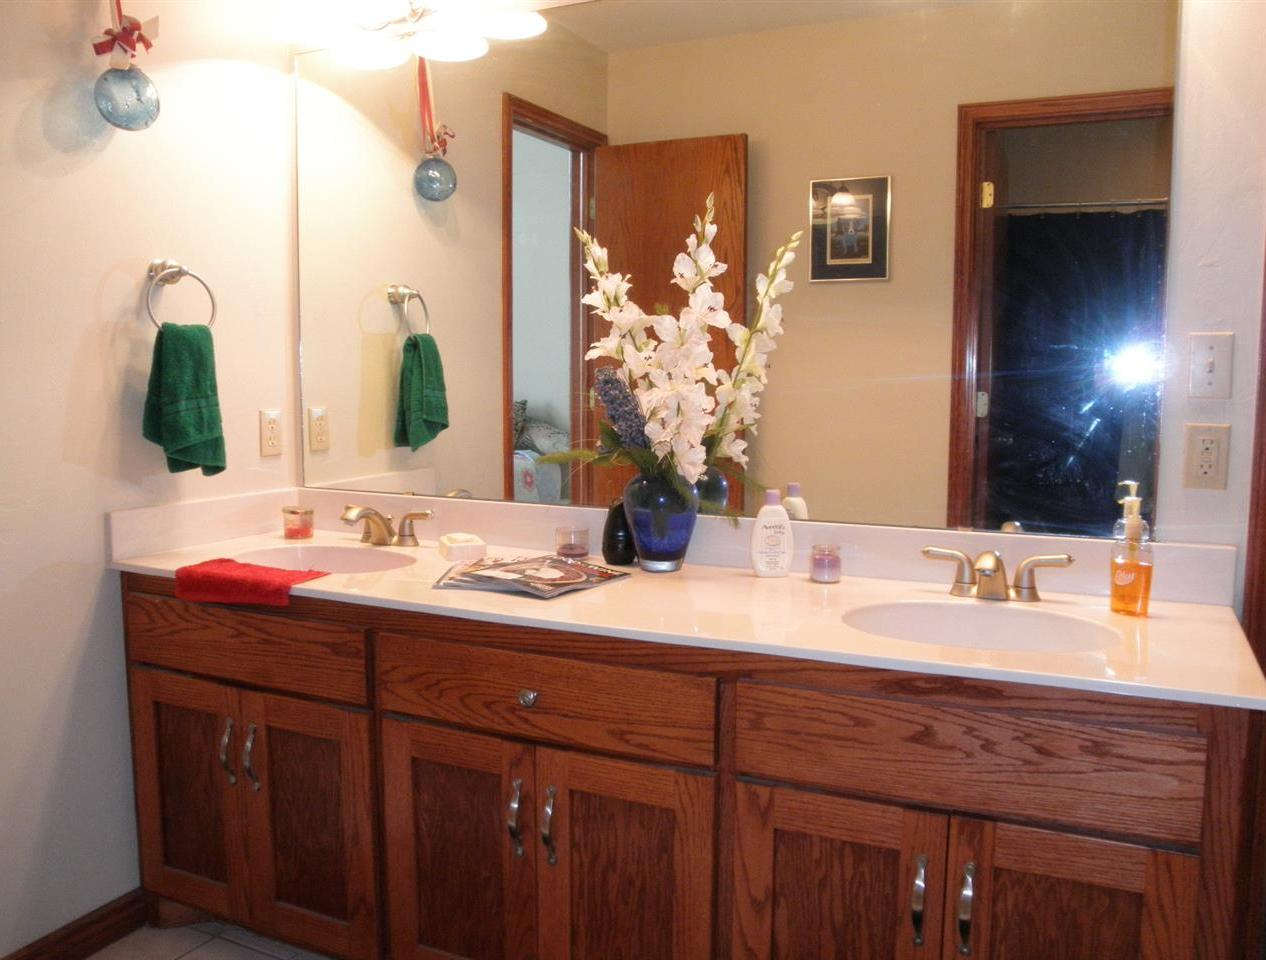 Sold Intraoffice W/MLS | 6855 Lake Road  Ponca City, OK 74604 23